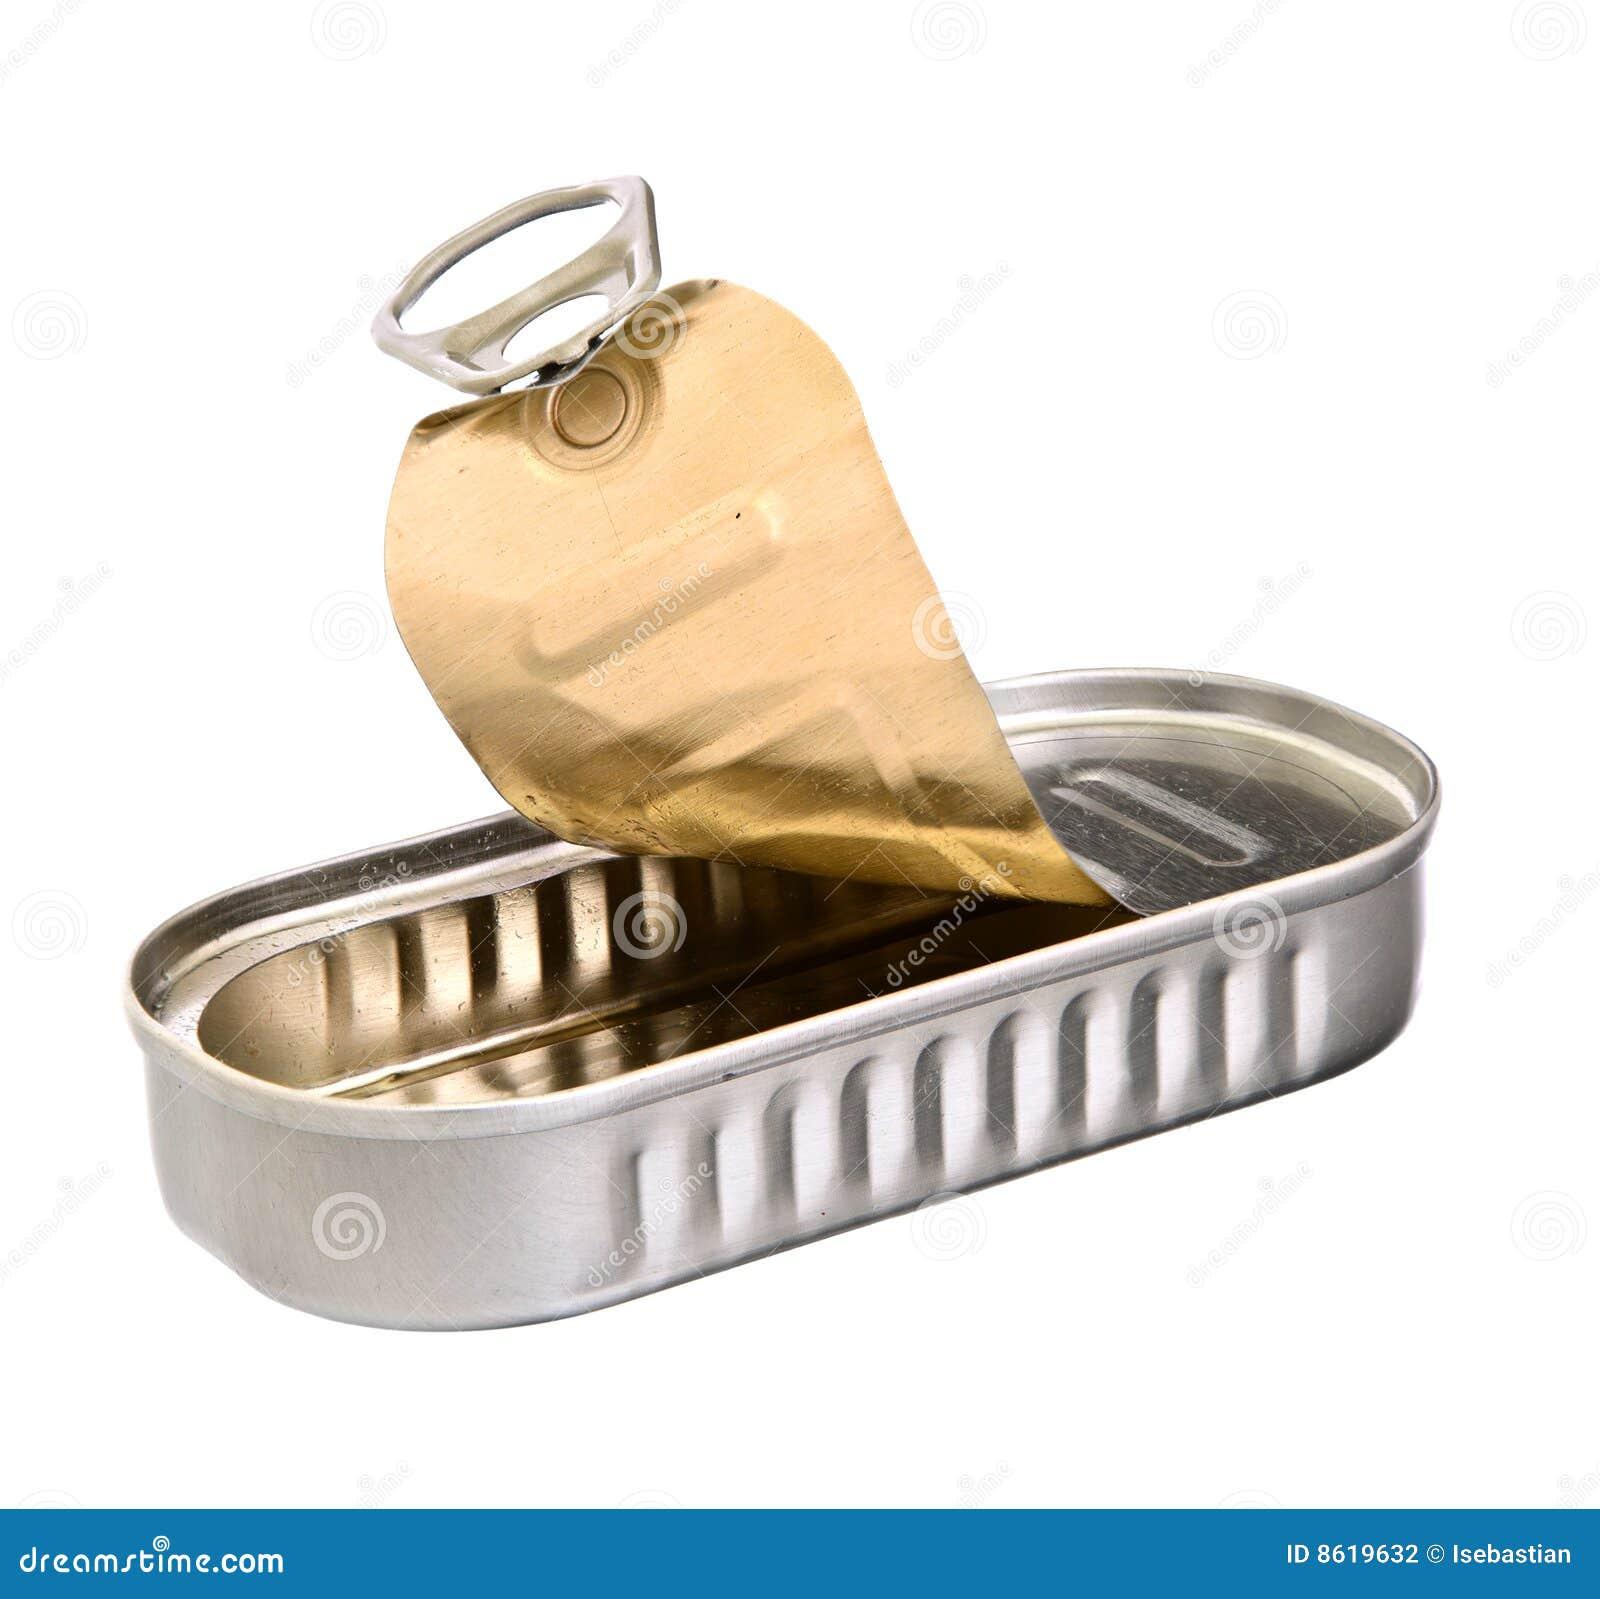 Sardine tin stock photo image of food empty background Empty sardine cans